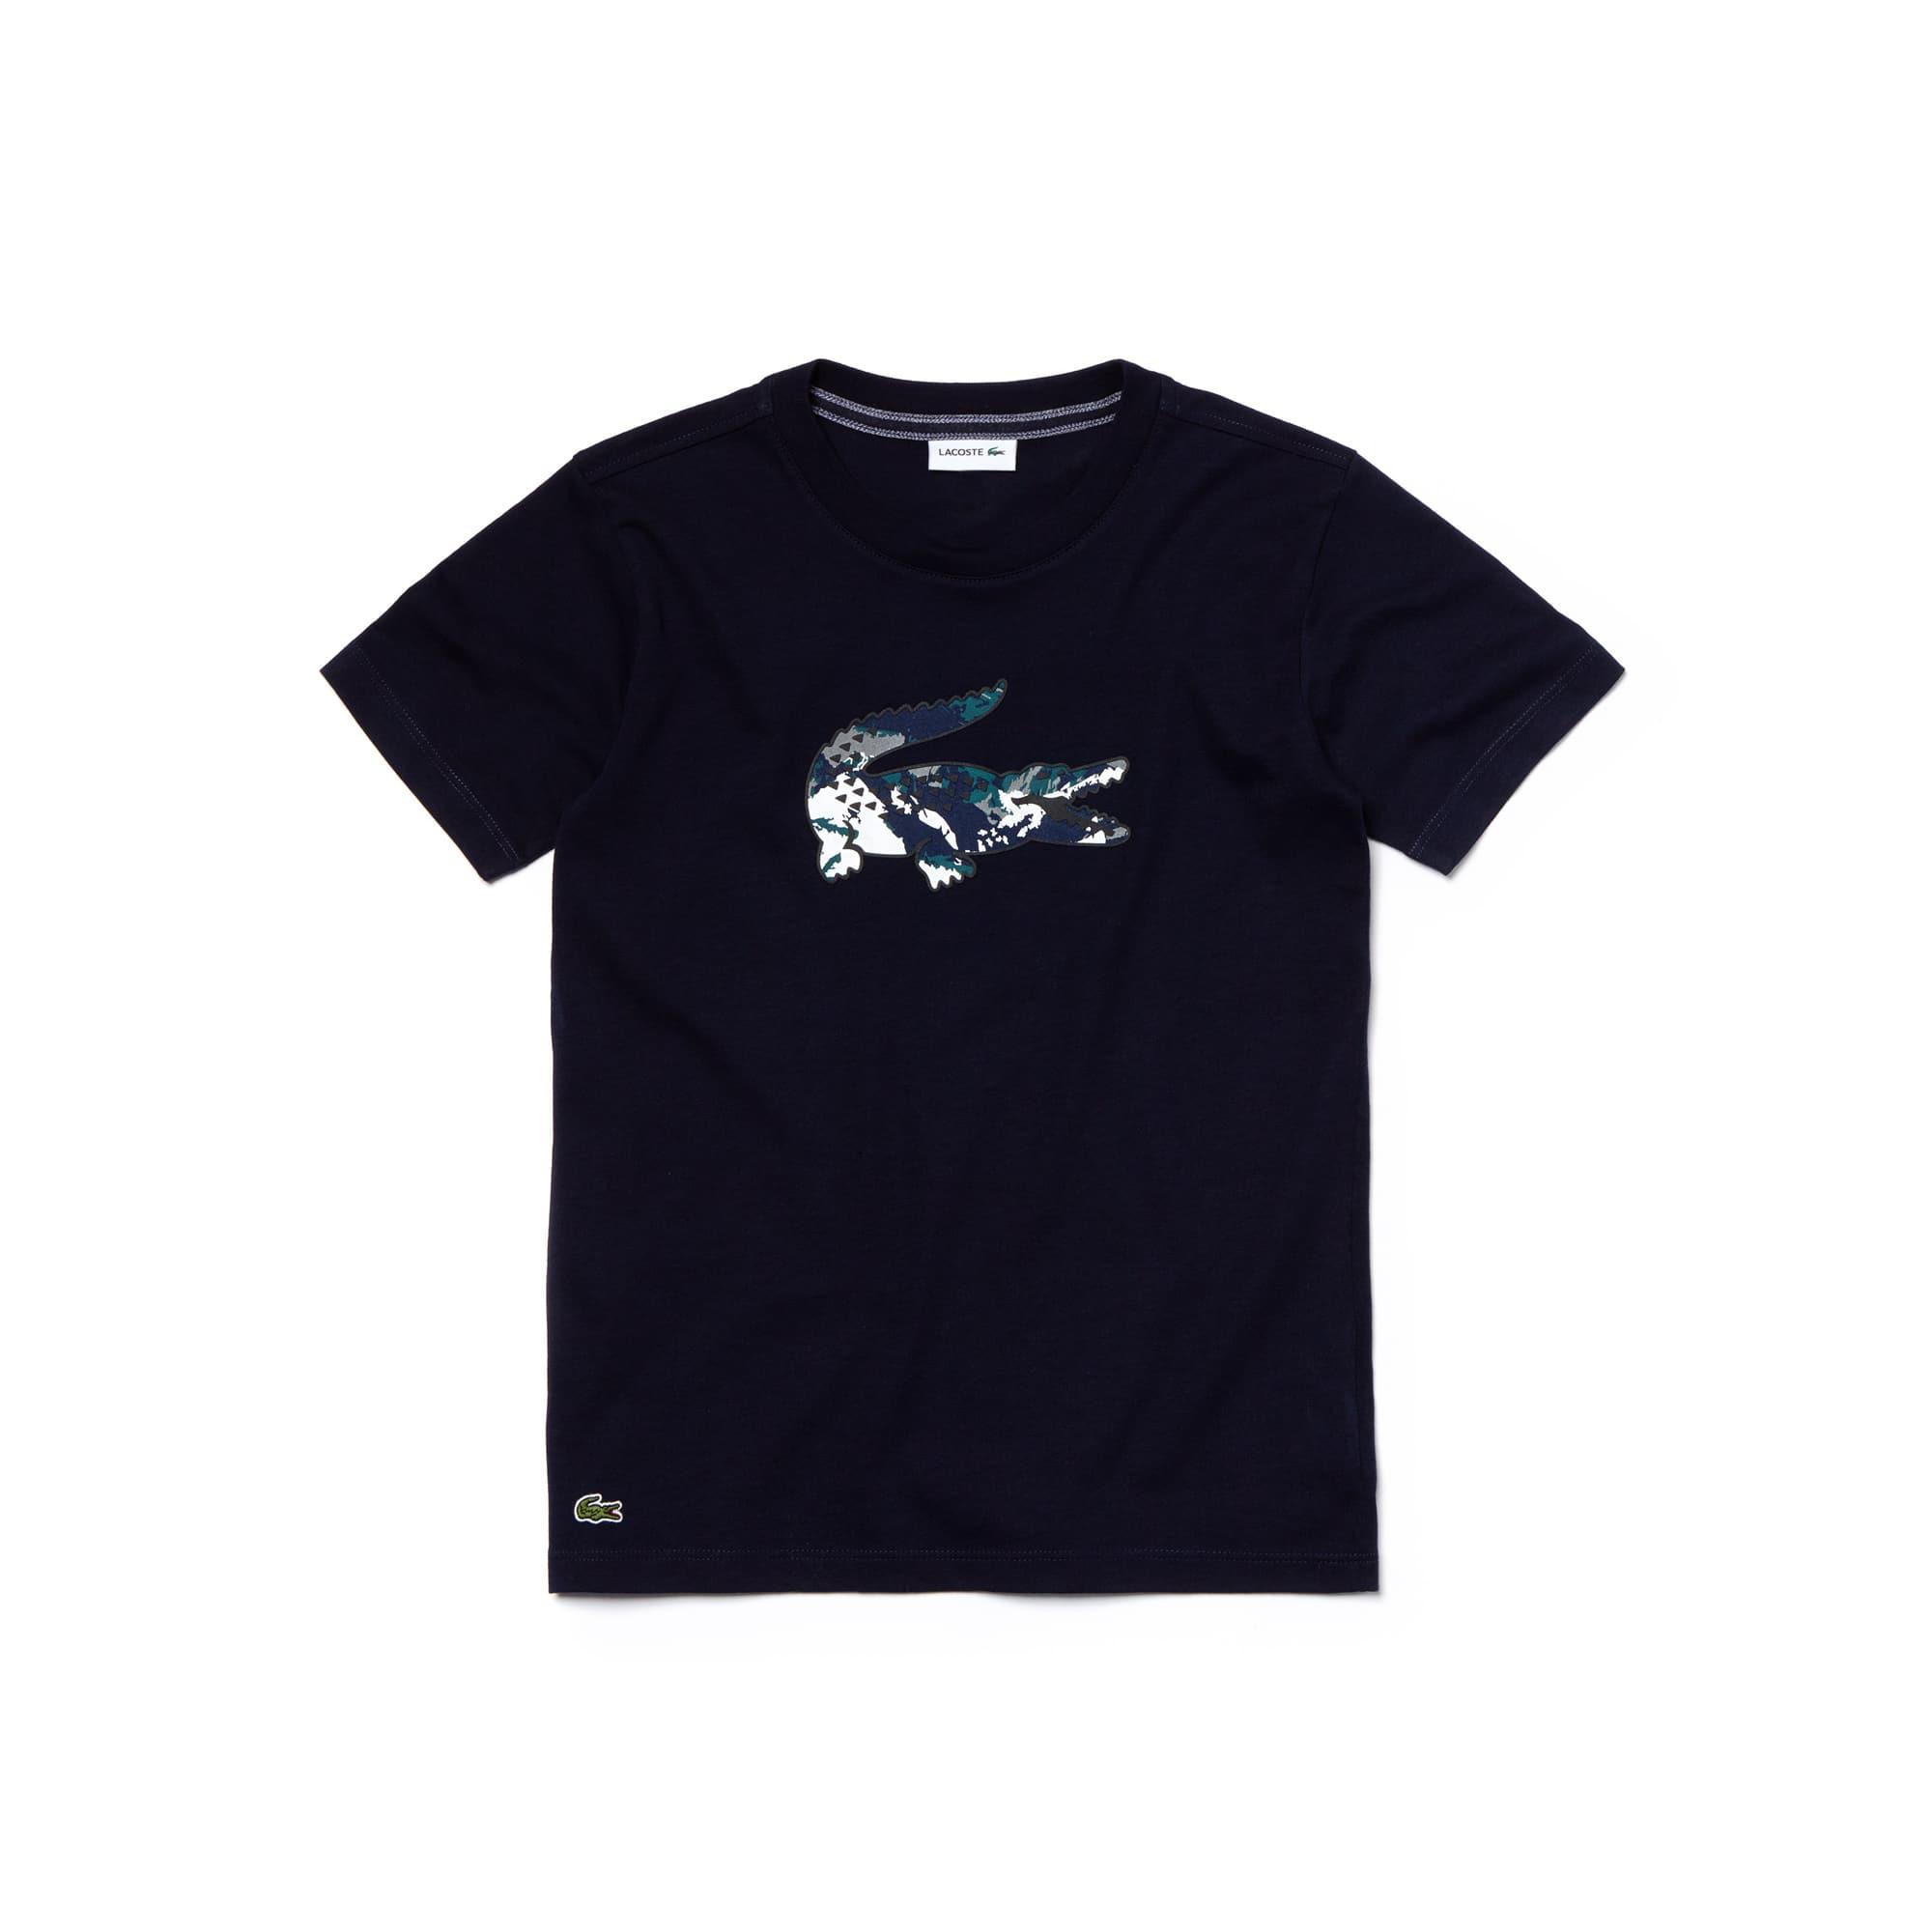 T-shirt jongens katoenjersey oversized krokodil